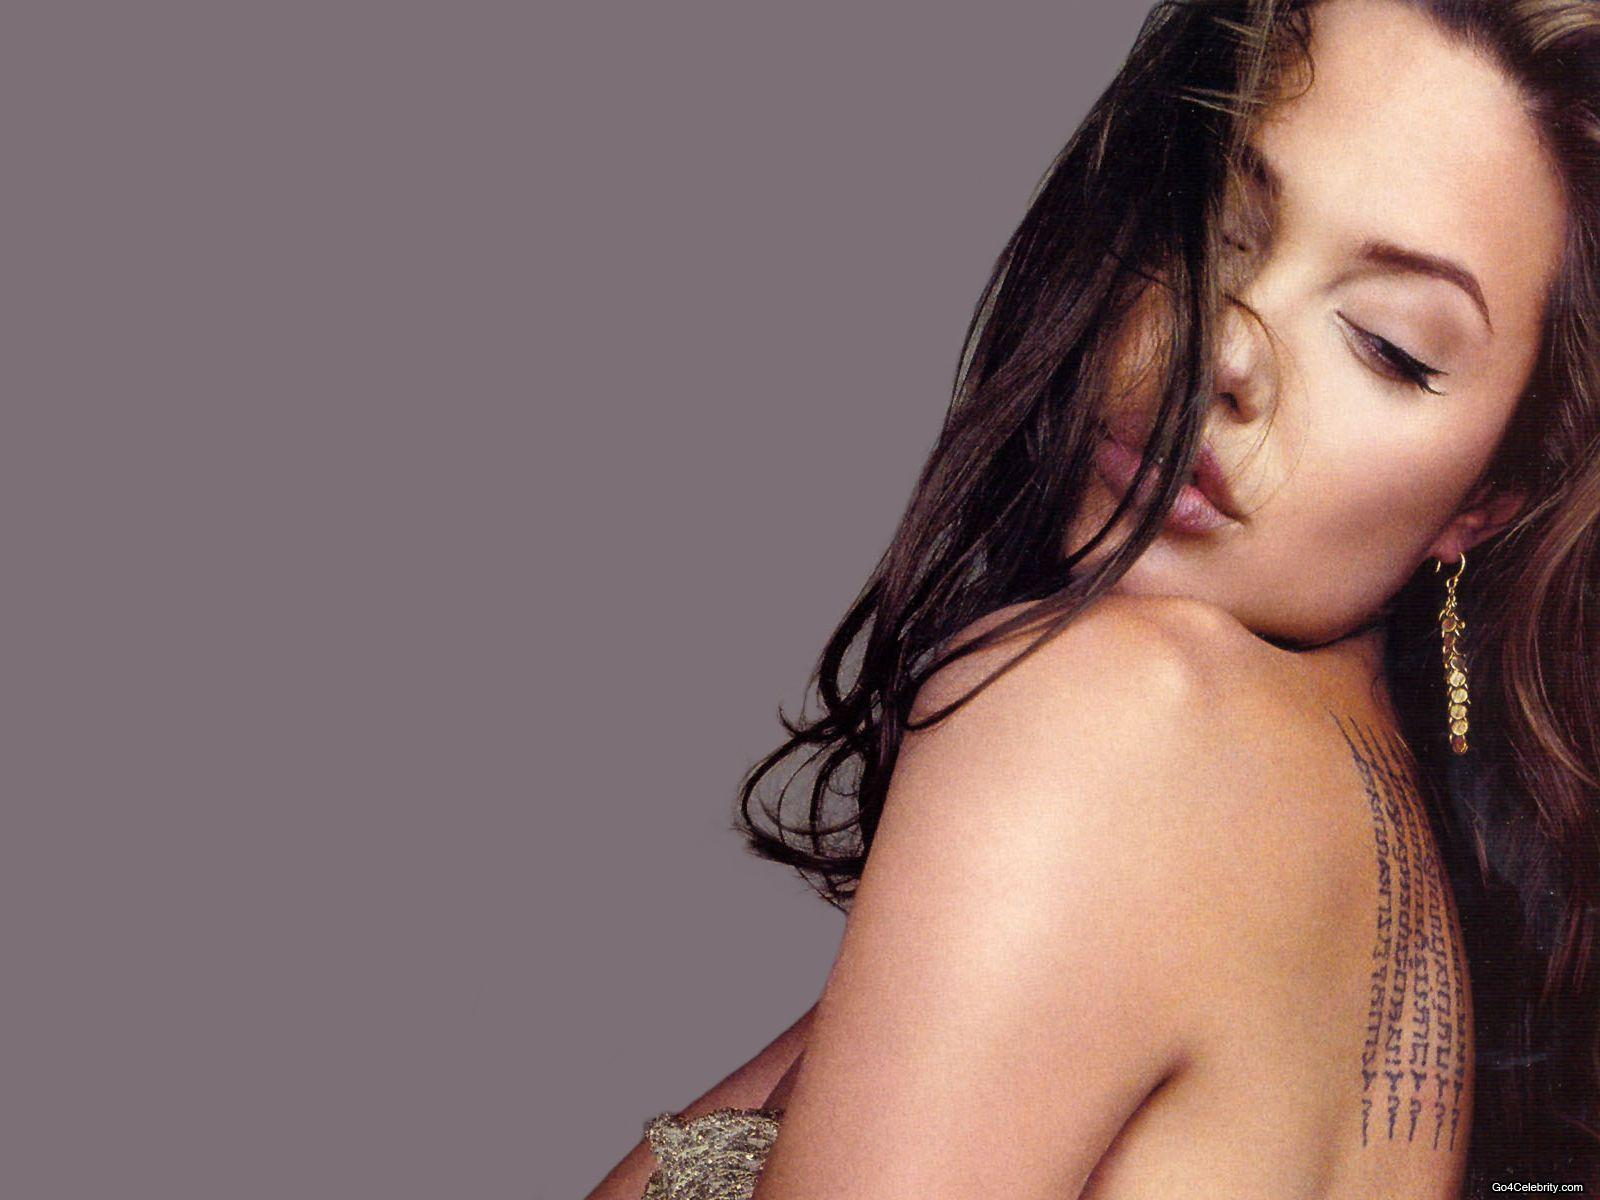 http://2.bp.blogspot.com/-_wgC0yQy9fs/TntFrU9miqI/AAAAAAAAAL4/0DNyce5fgI4/s1600/Angelina-Jolie-05.jpg